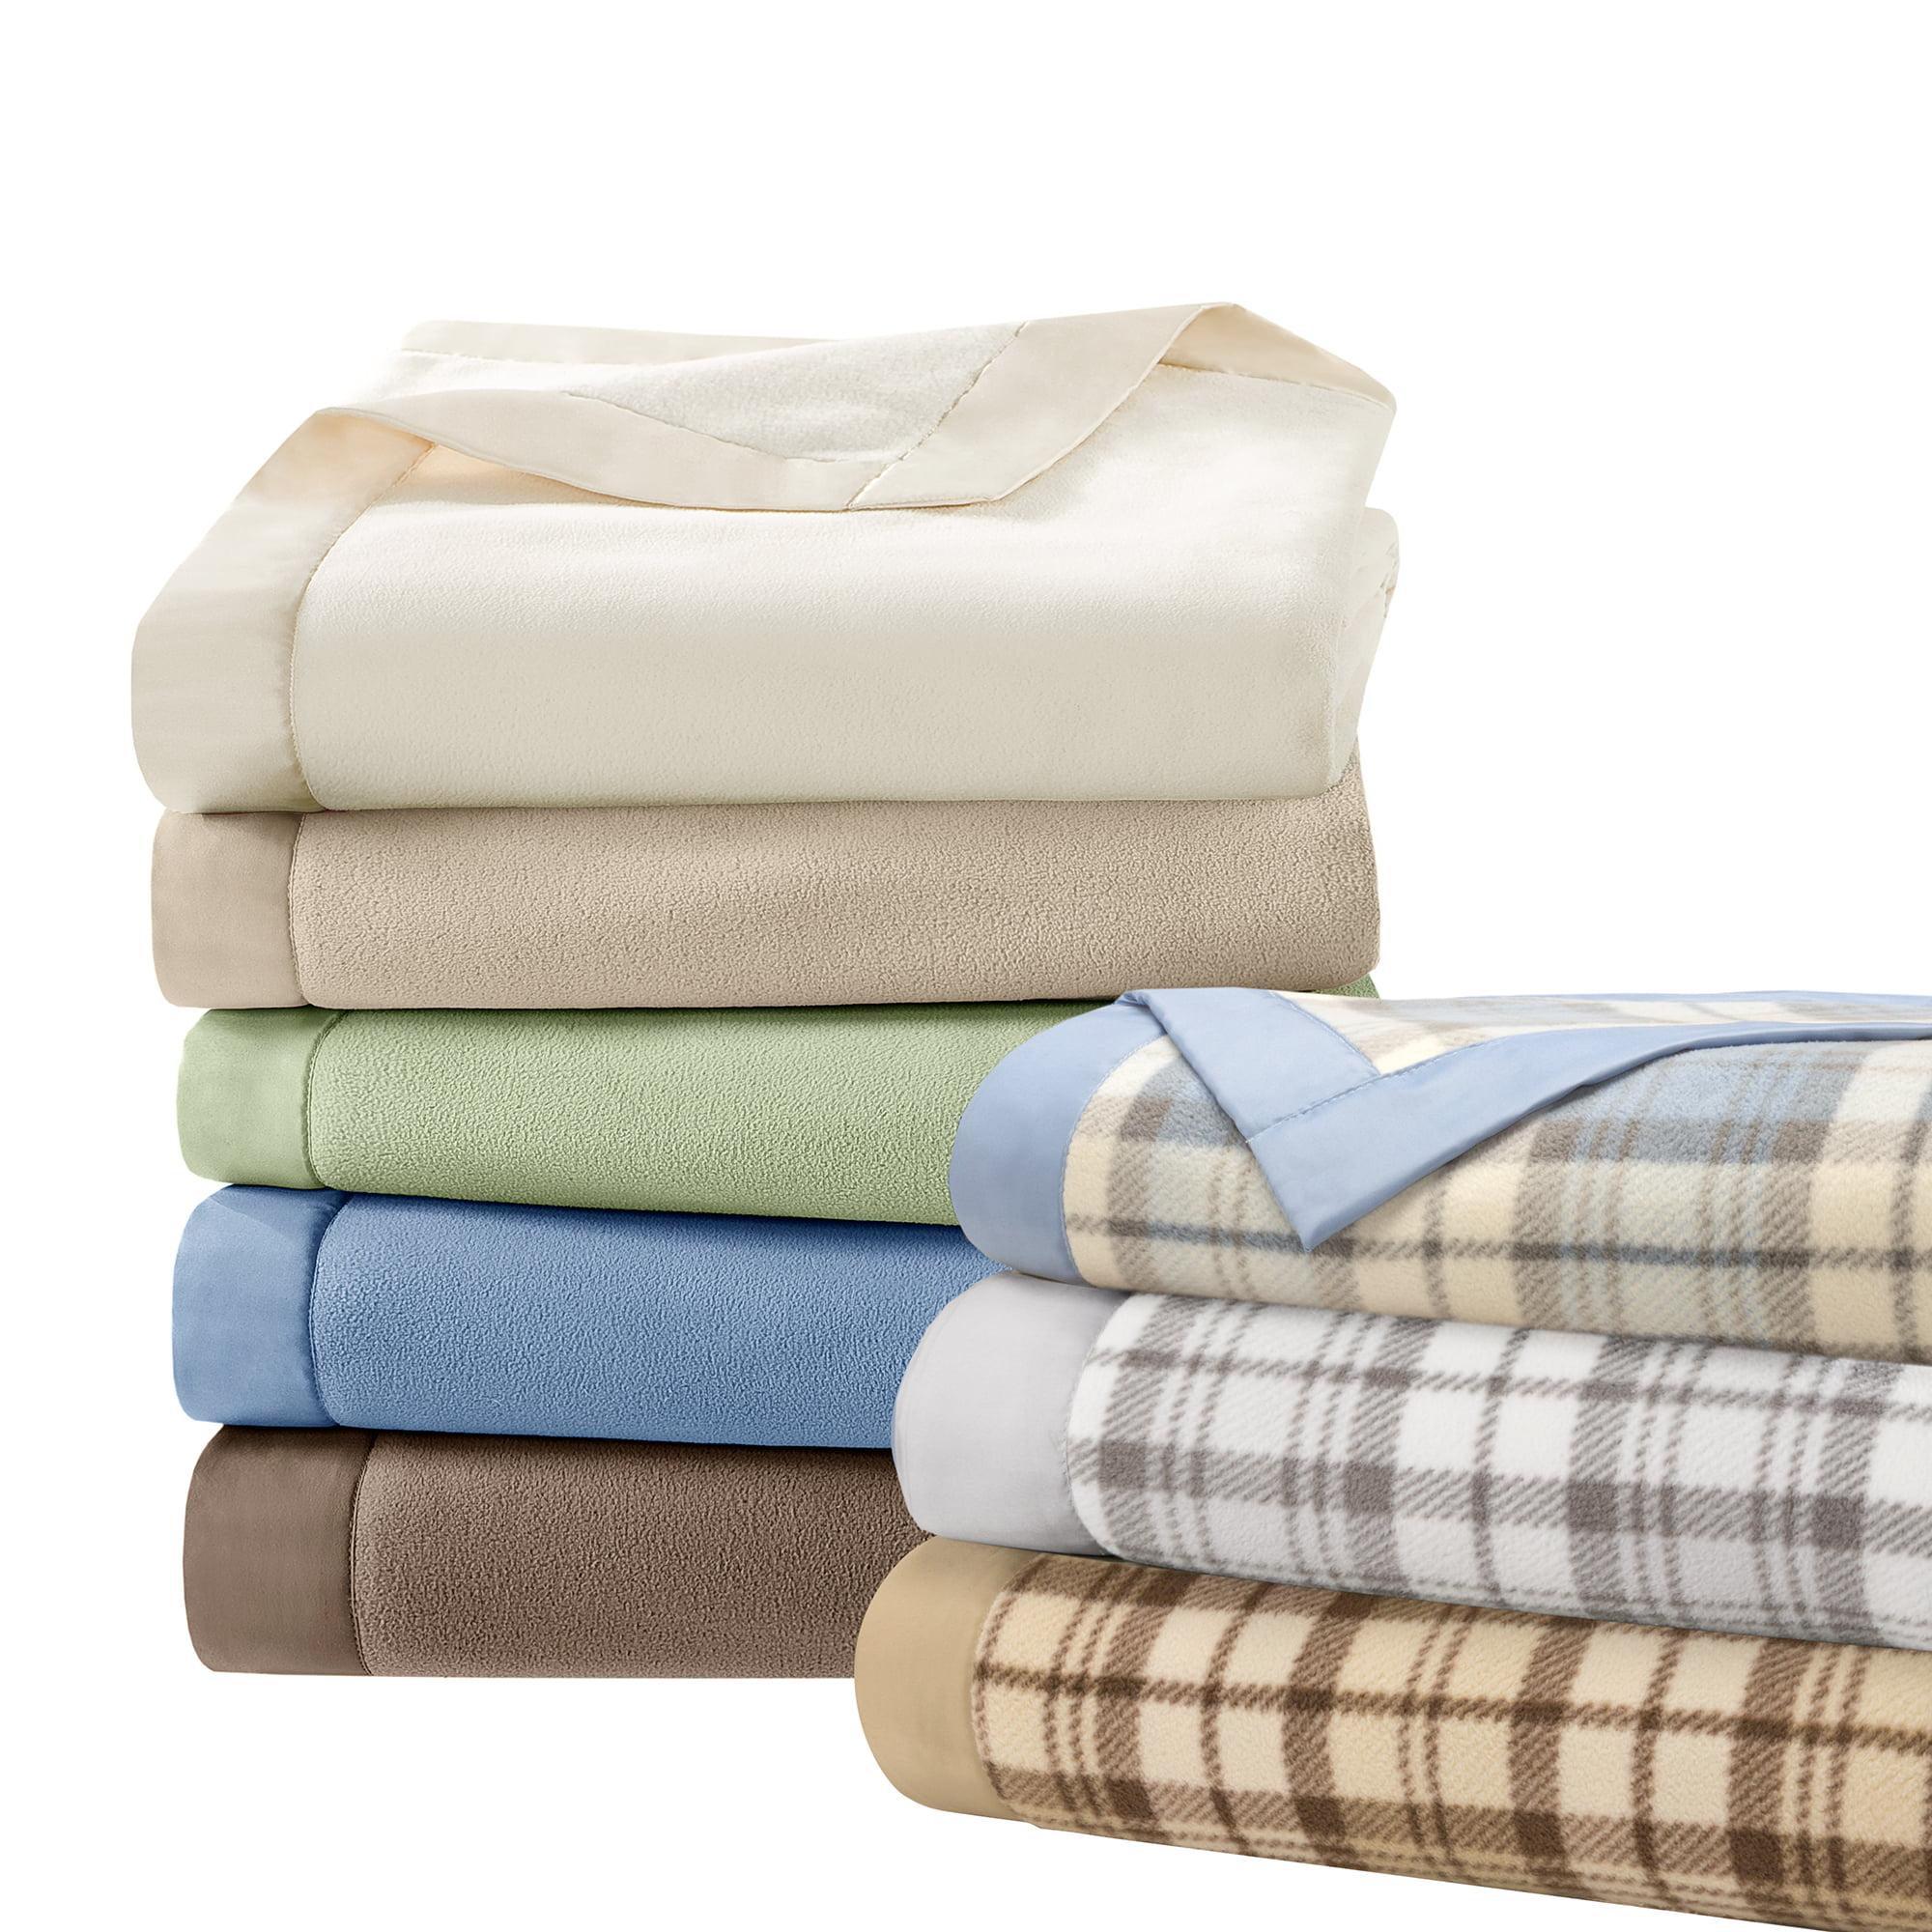 Comfort Classics Soft Brushed Lightweight Micro Fleece Blanket by E & E CO LTD